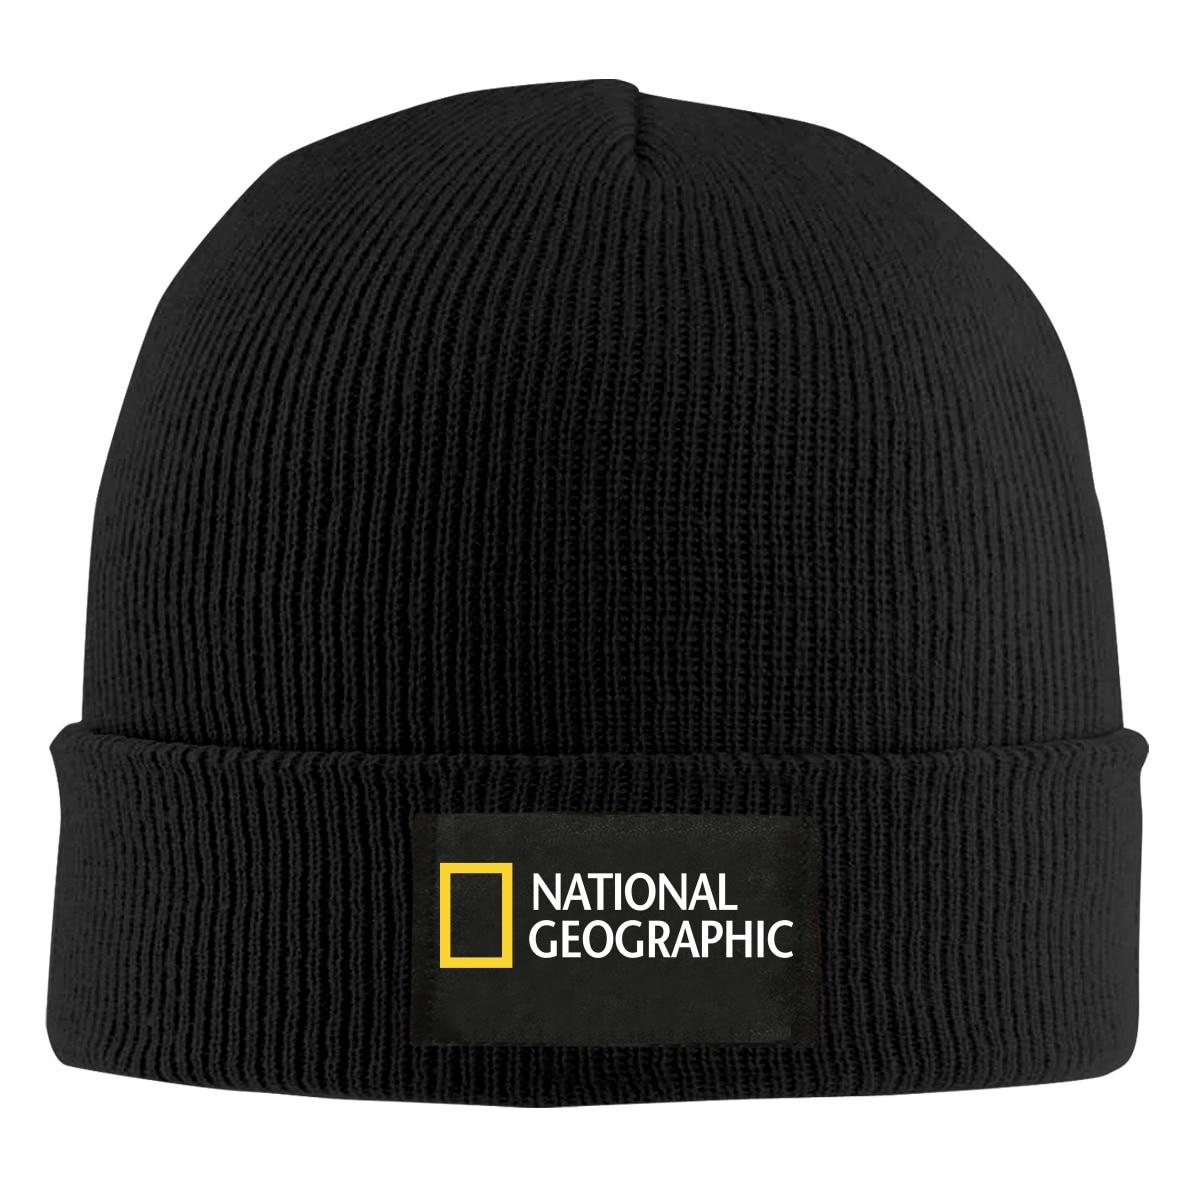 National Geographic LOGO Print Beanie men women Knit Cap Knitted Hat Skullies Warm Winter Unisex Ski Hip Hop outdoor Hat